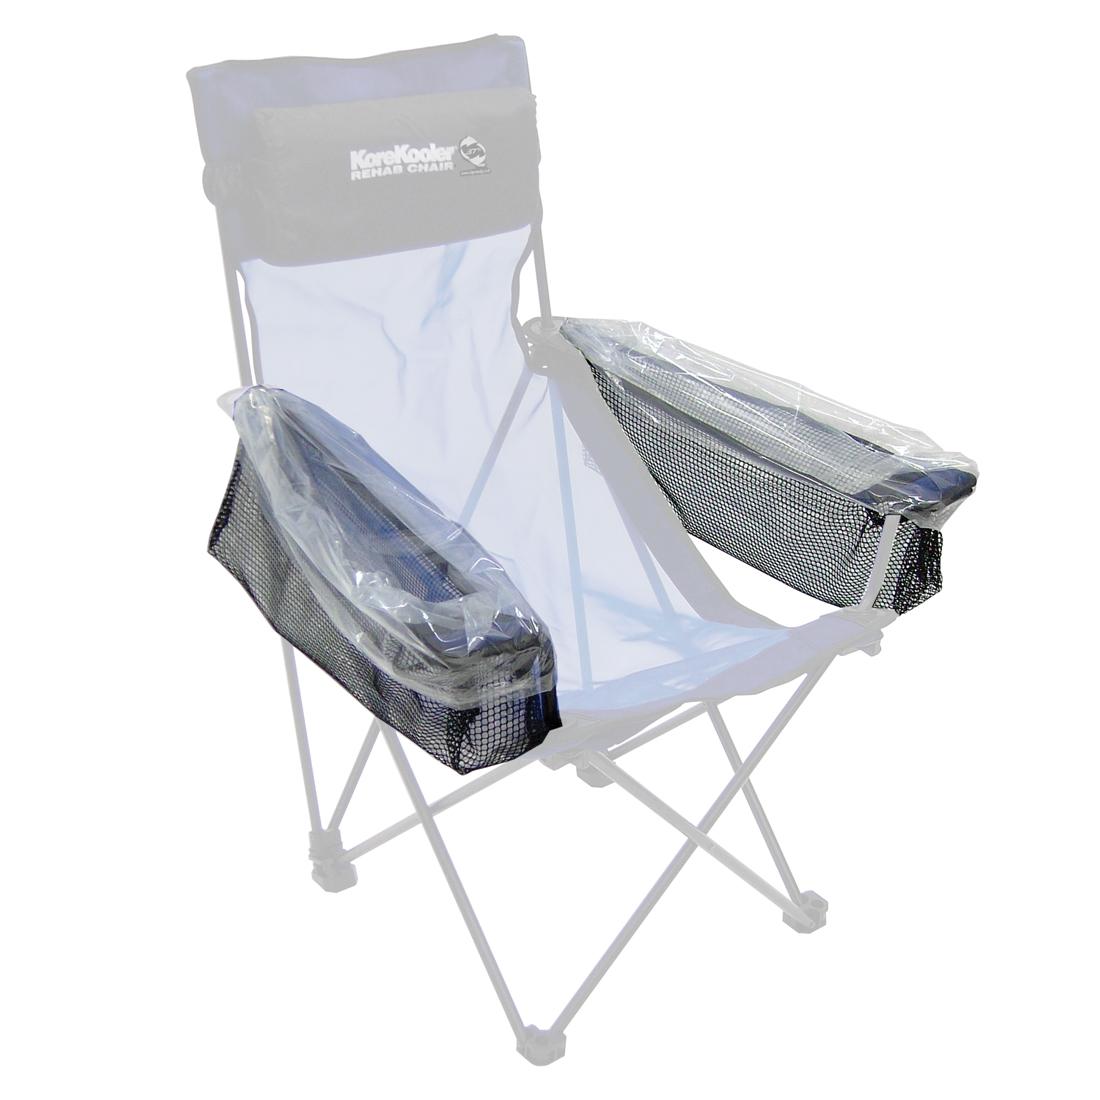 Kore Kooler Rehab Chair Replacement Reservoir Bags image